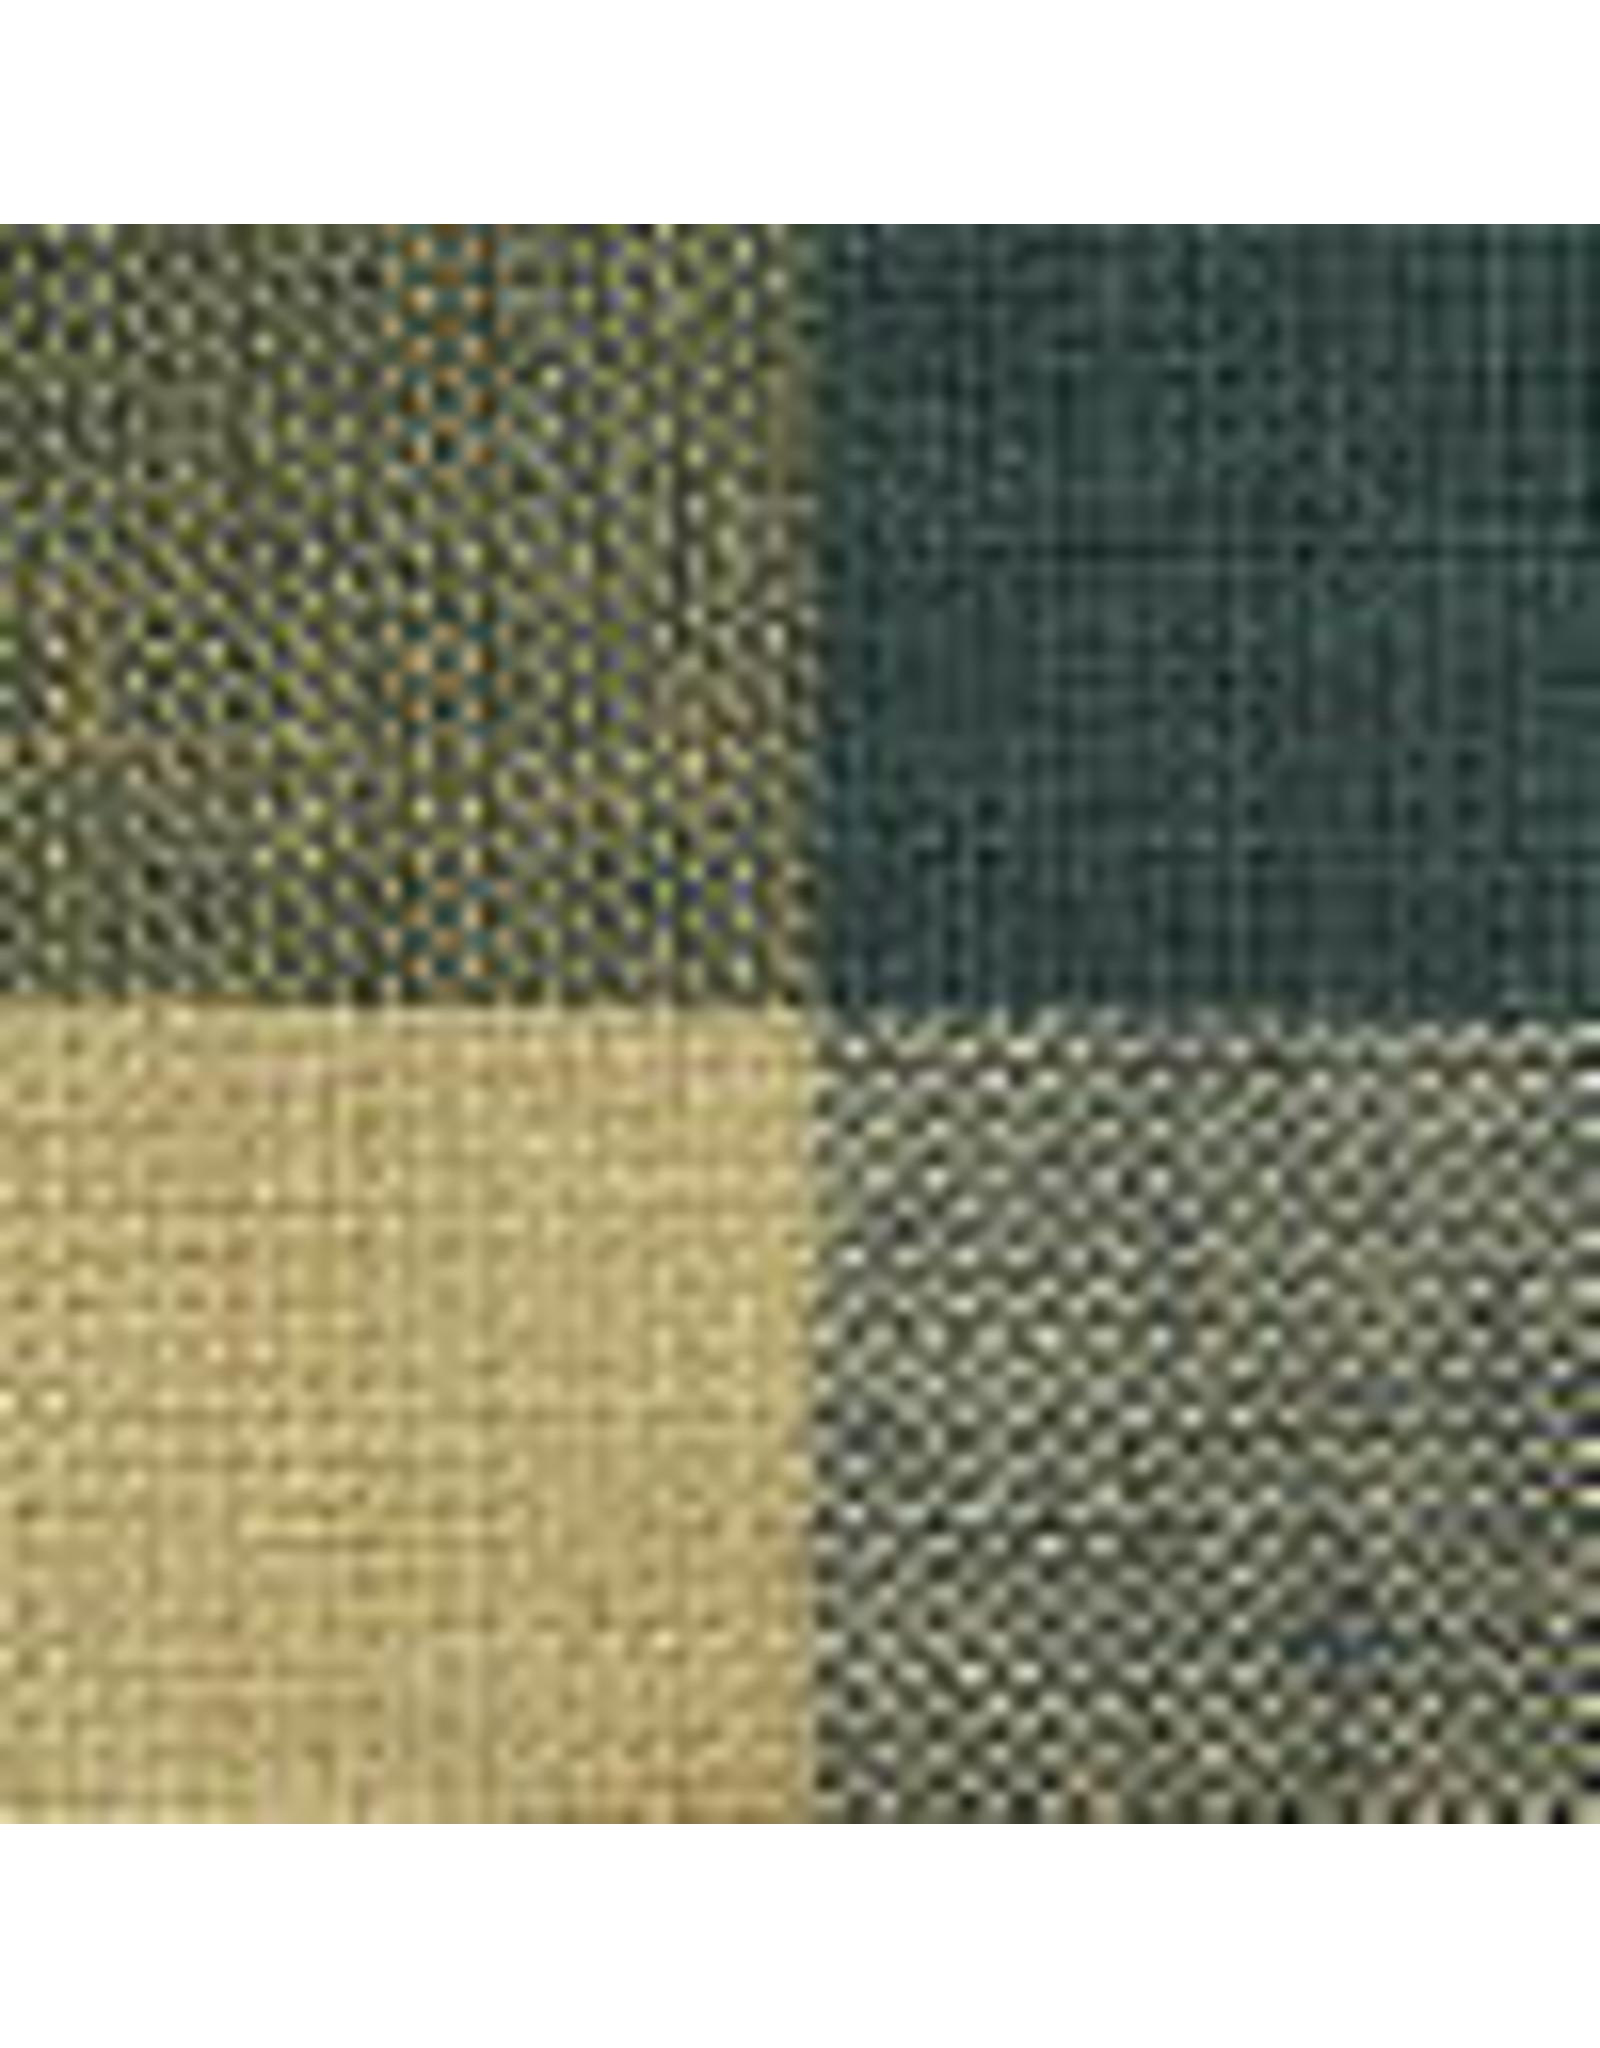 Yd. Green and Tan Buffalo Check Fabric #490